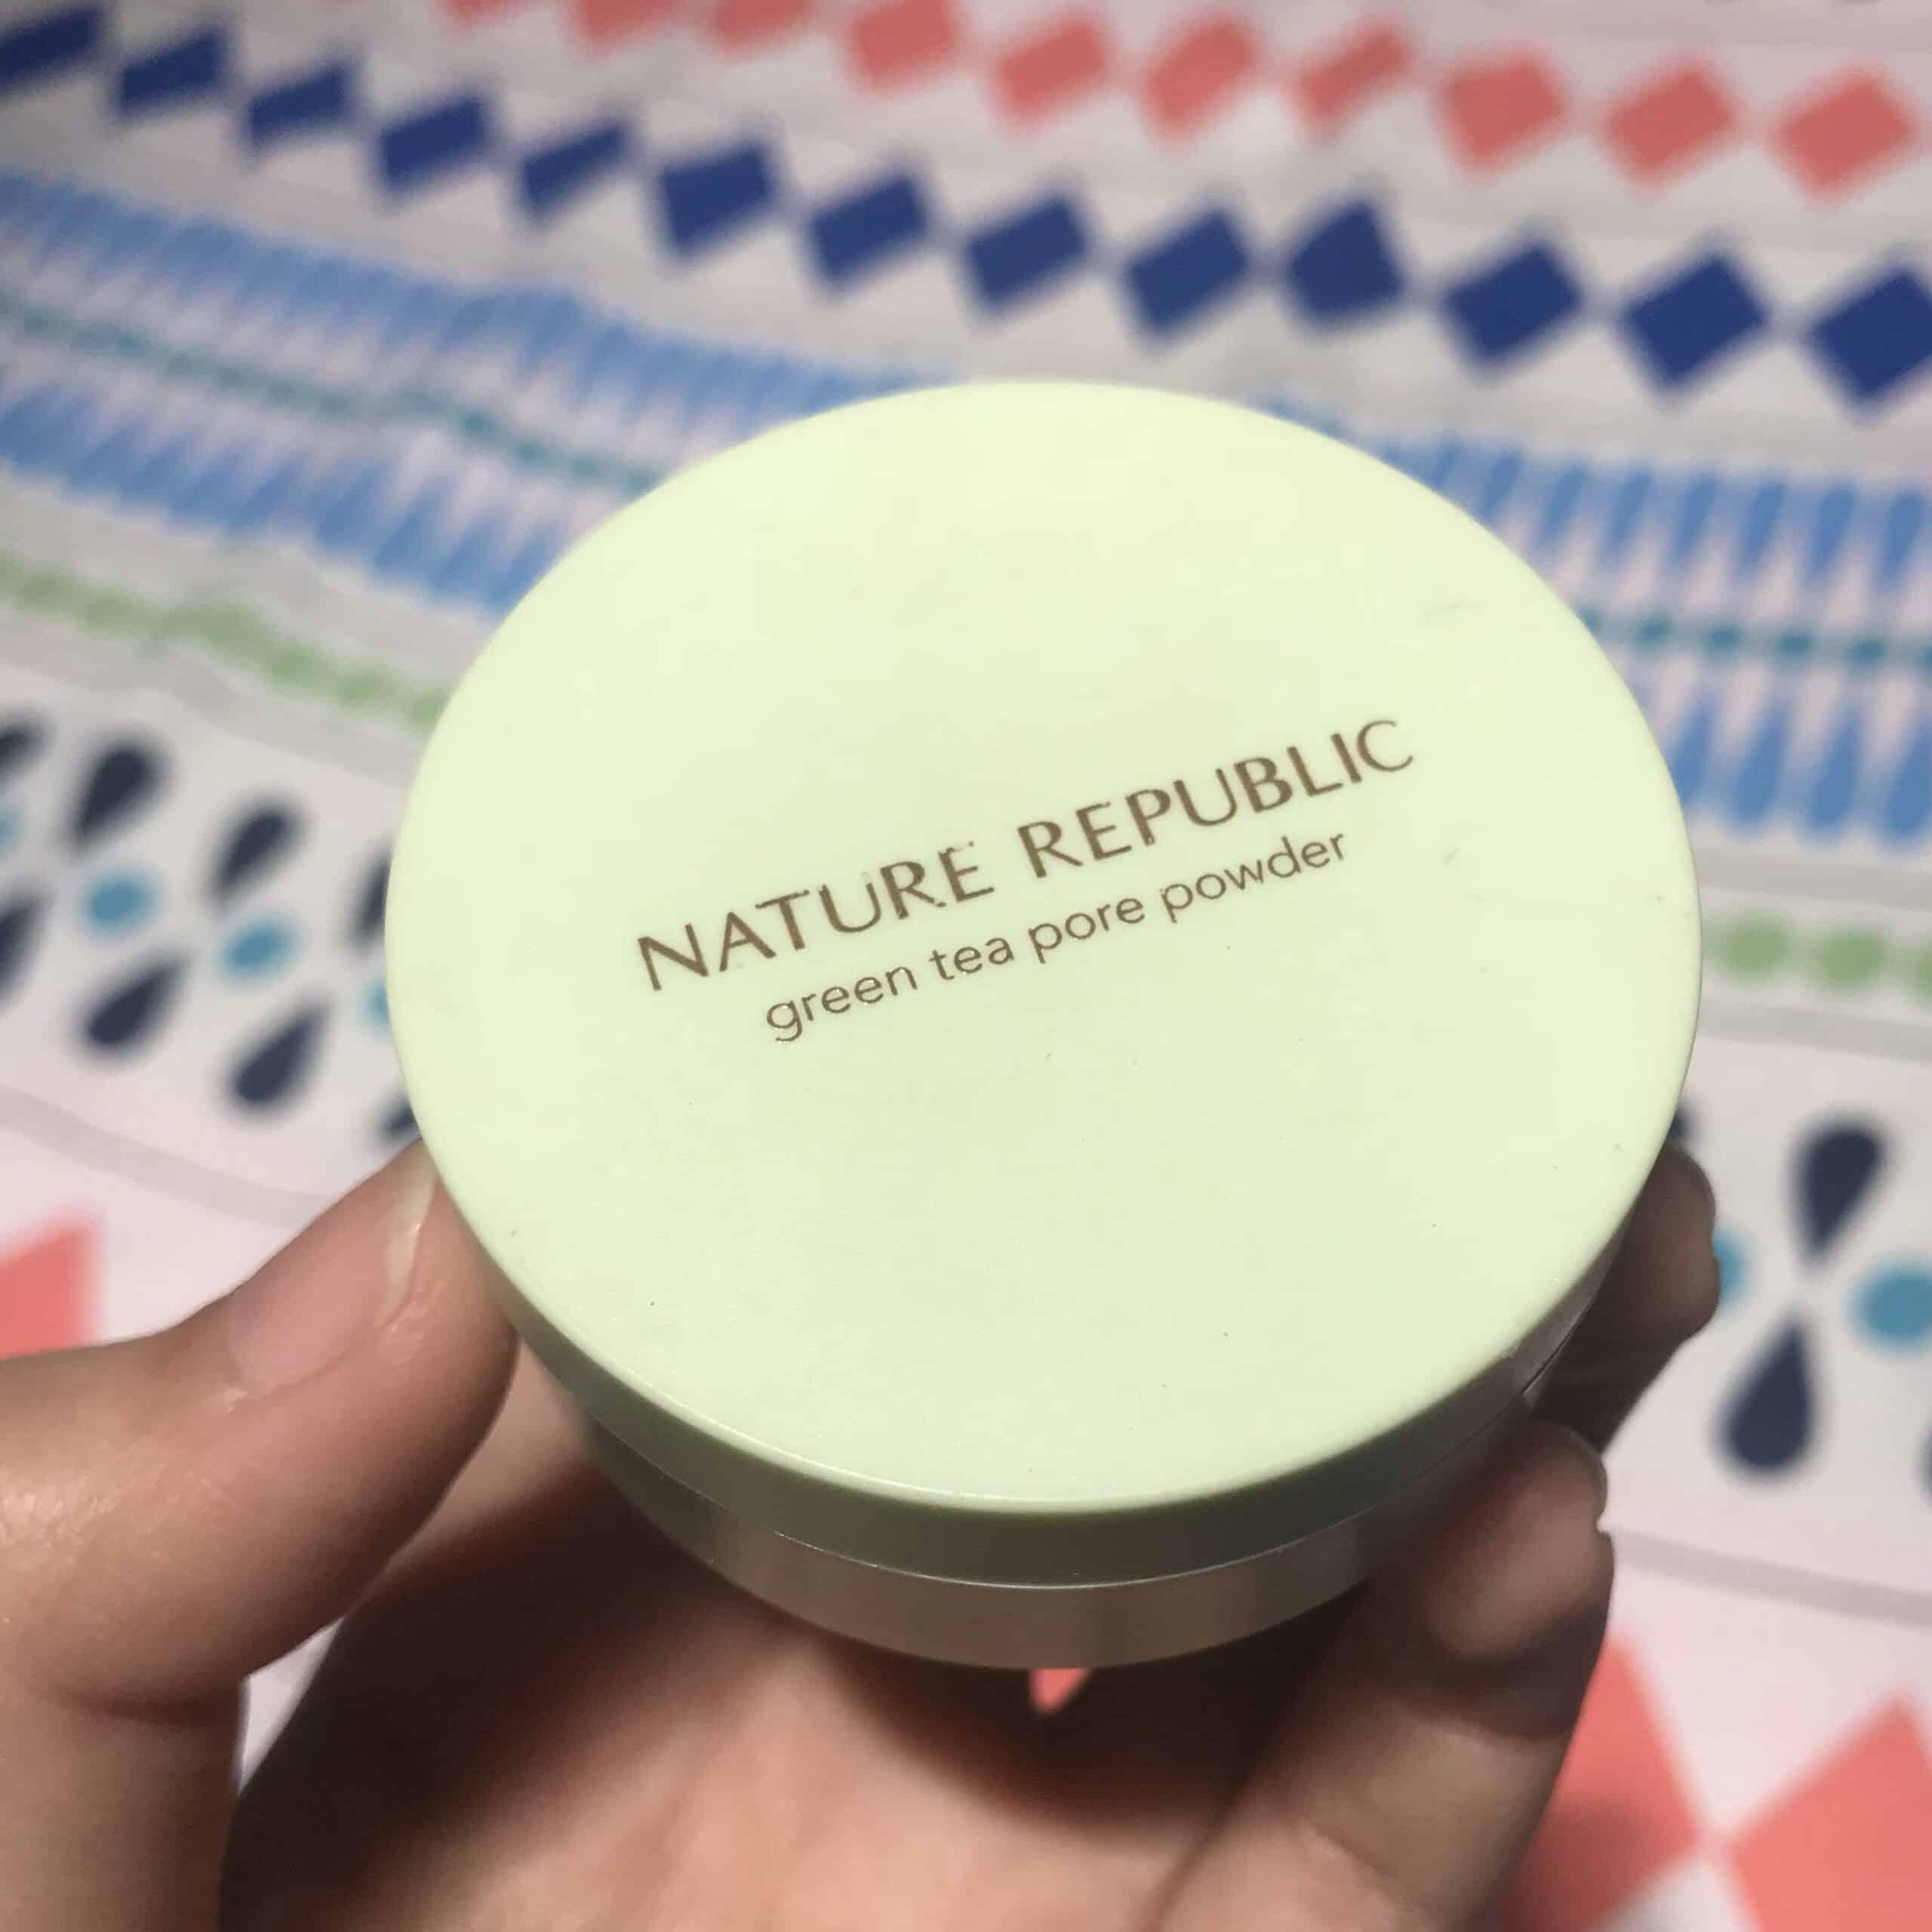 Nature-Republic-Green-Tea-Pore-Powder-scaled